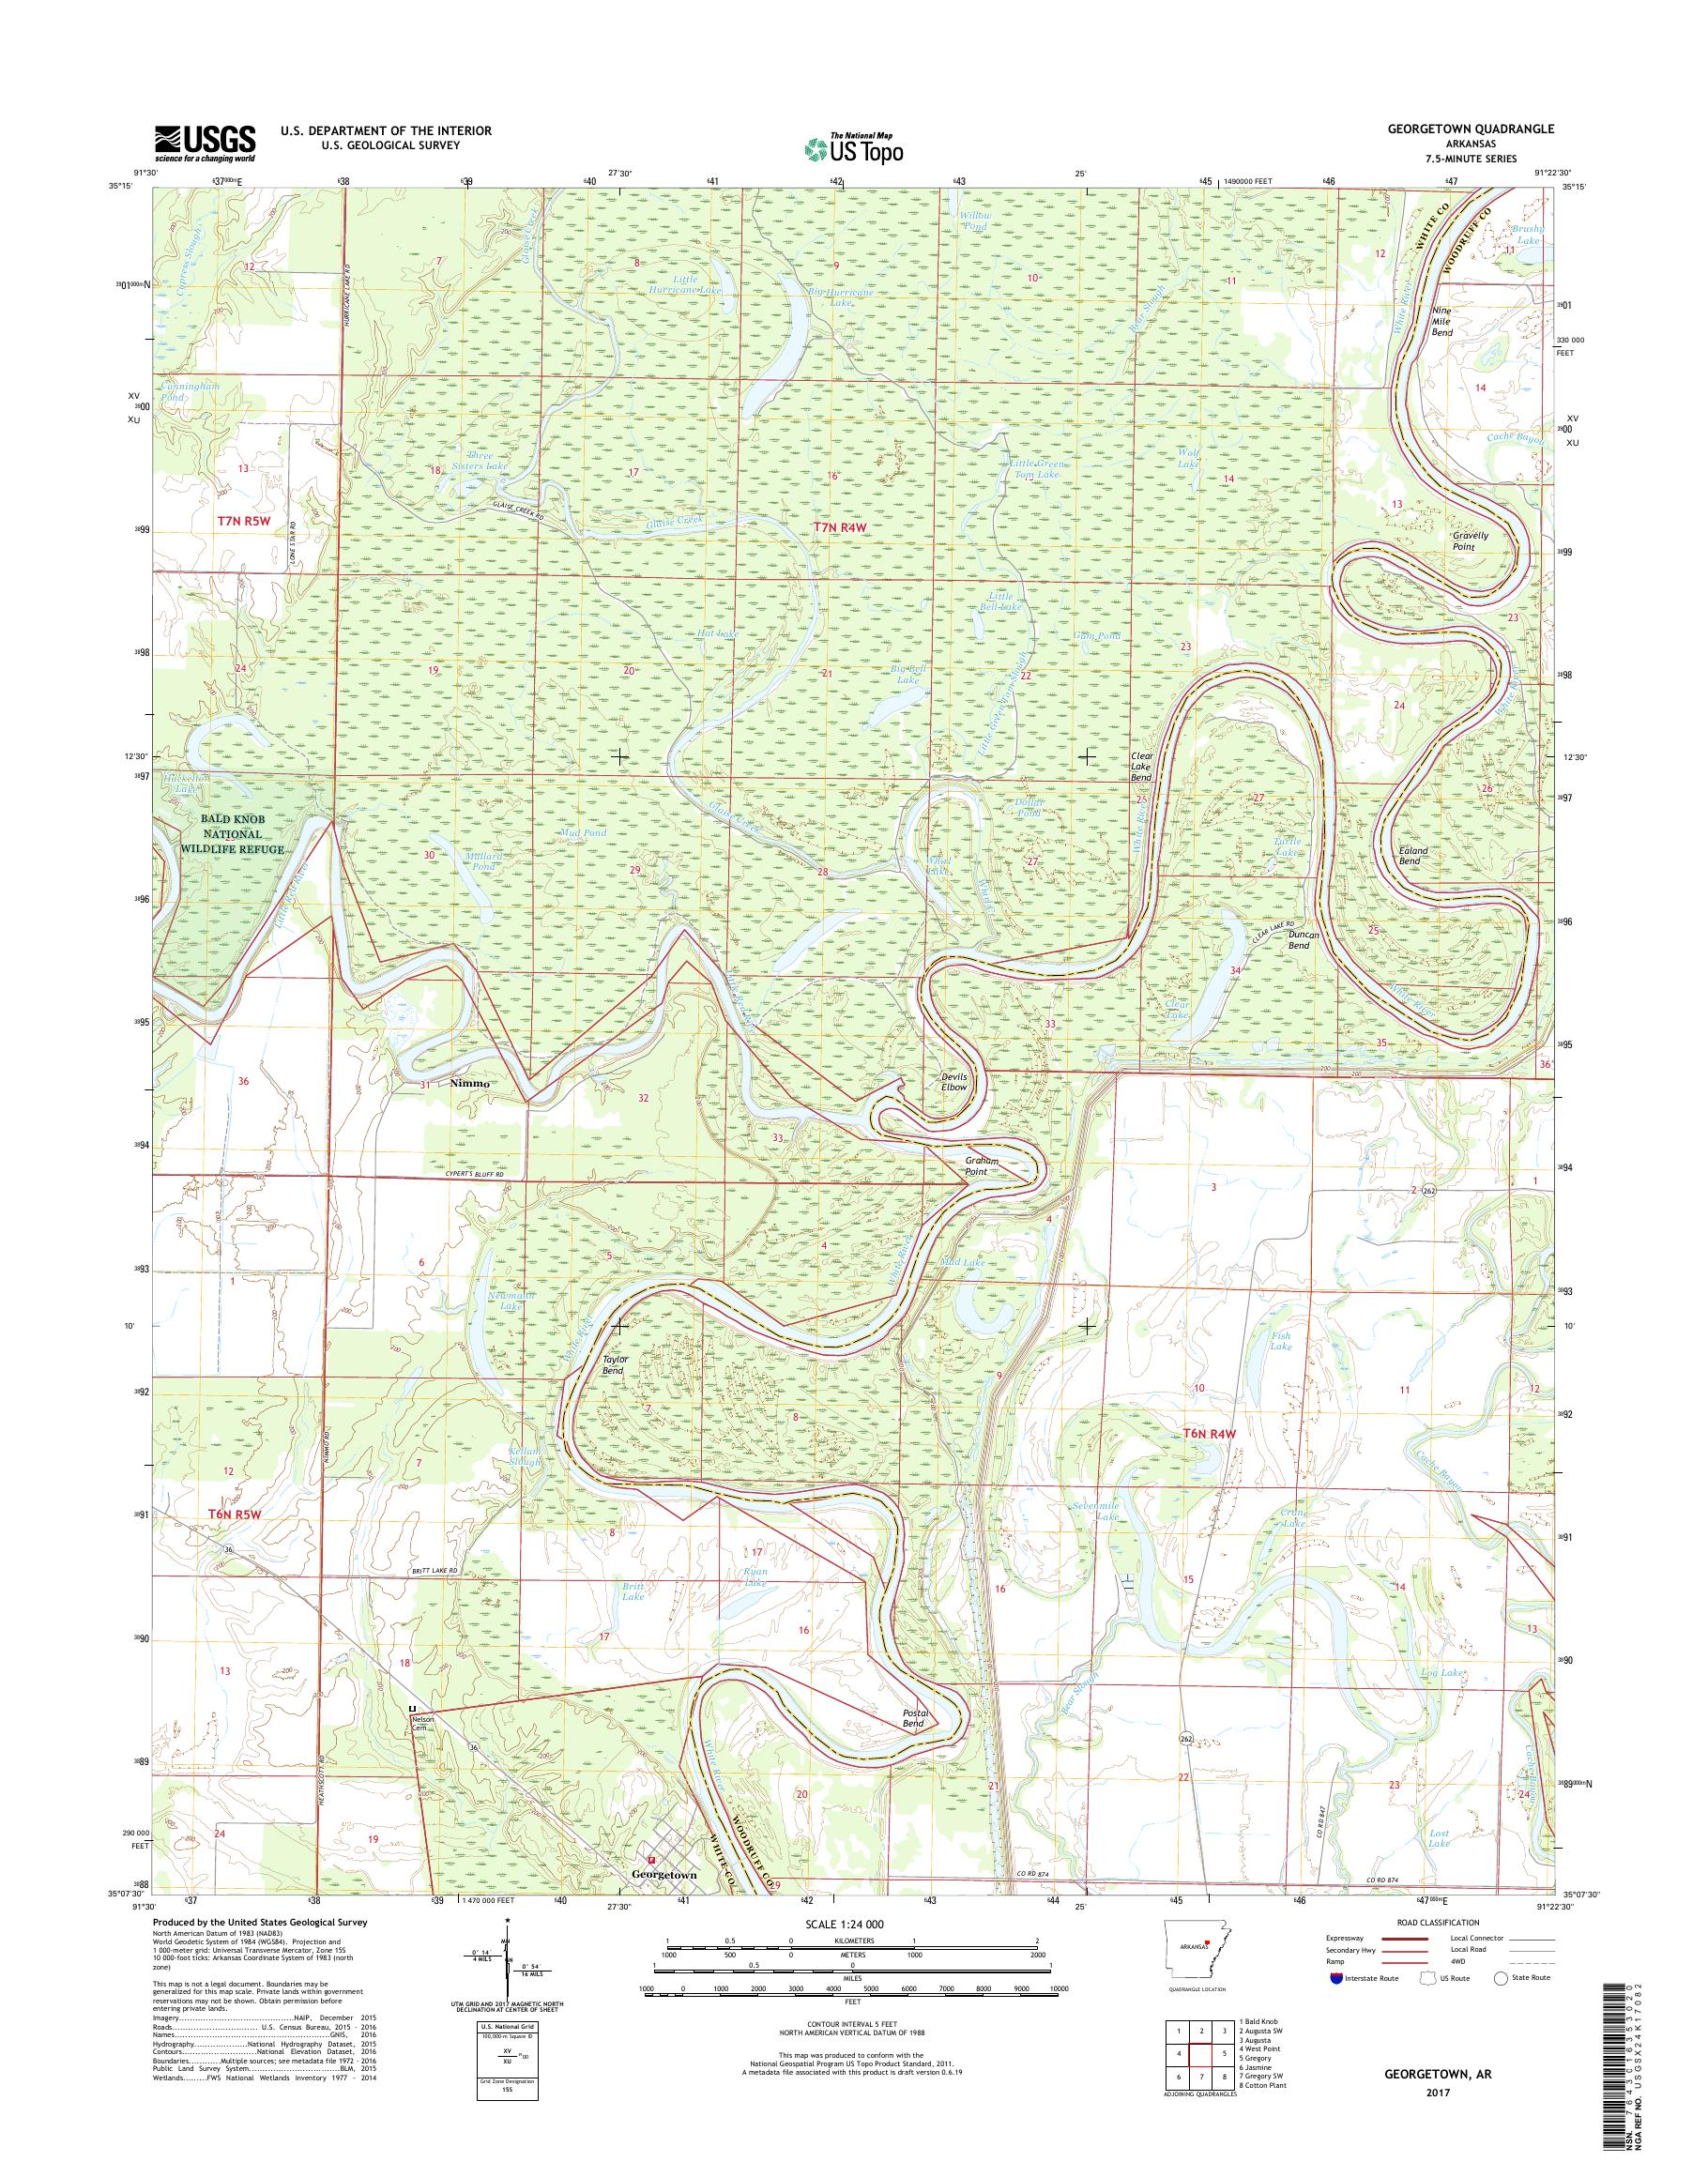 MyTopo Georgetown, Arkansas USGS Quad Topo Map